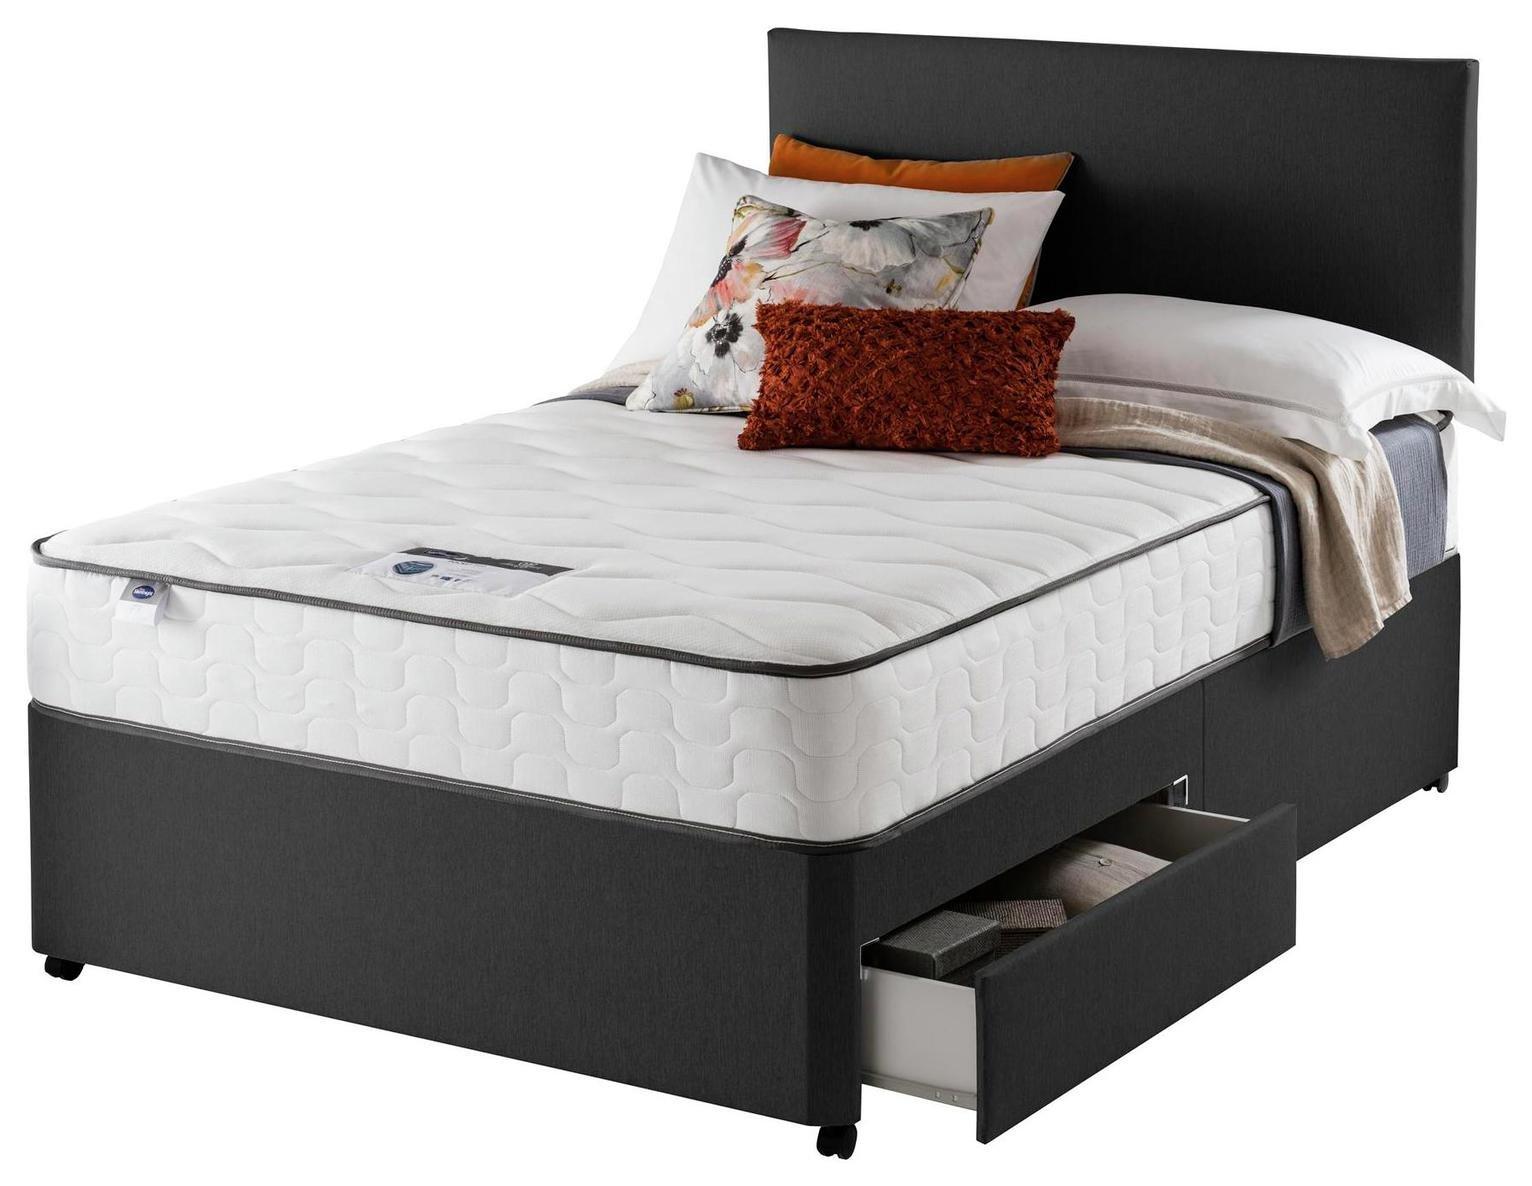 Silentnight Middleton 800 PKT Comfort 2DRW Ccoal Superking